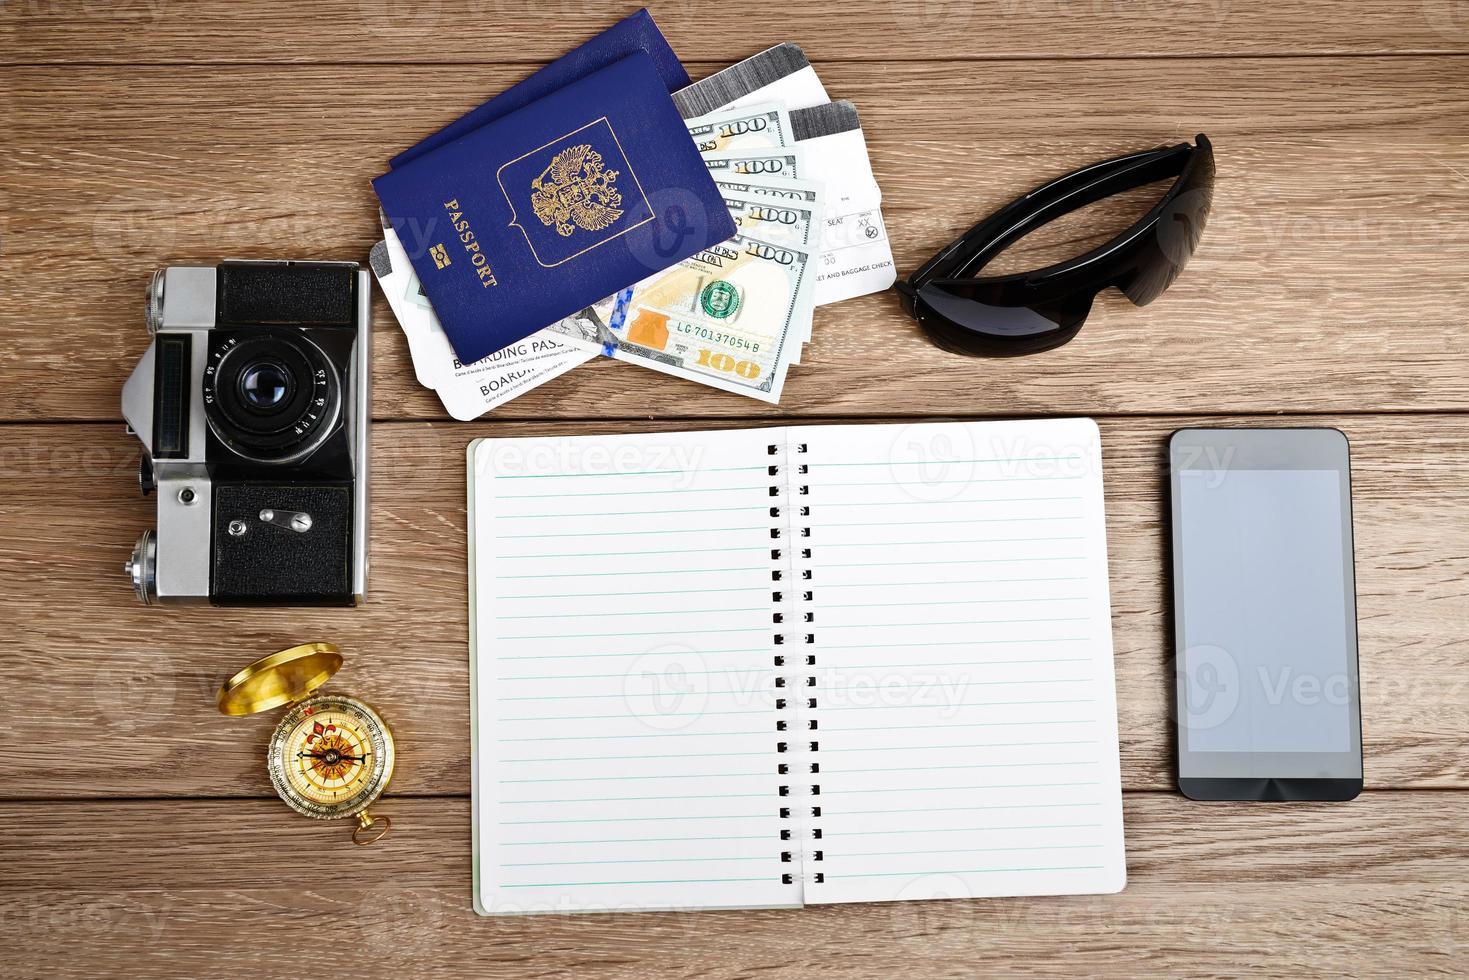 concepto de turismo: boletos aéreos, pasaportes, teléfono inteligente, brújula, ca foto